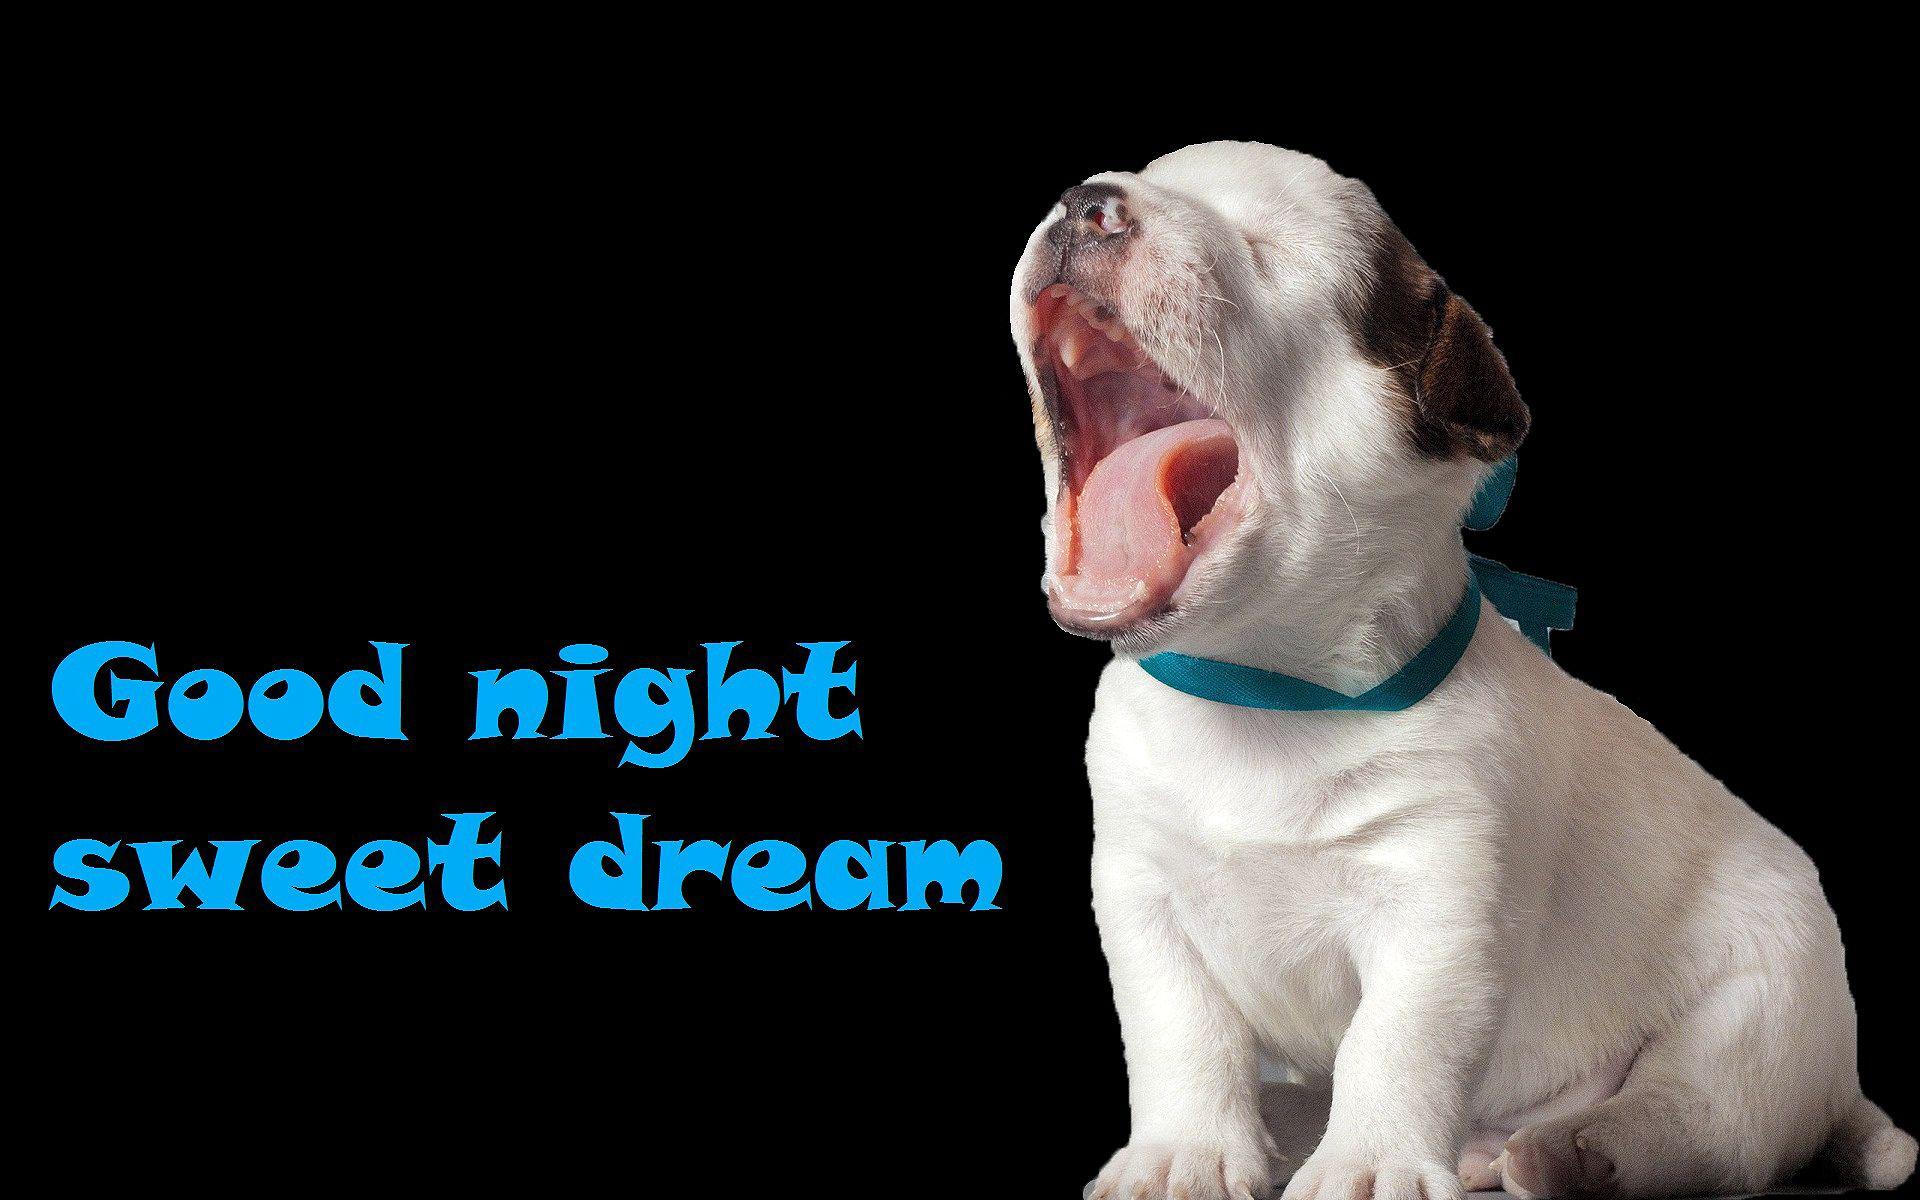 Yawing Cute Pup Good Night Jpg 1920 1200 Good Night Funny Good Night Sweet Dreams Funny Good Night Images